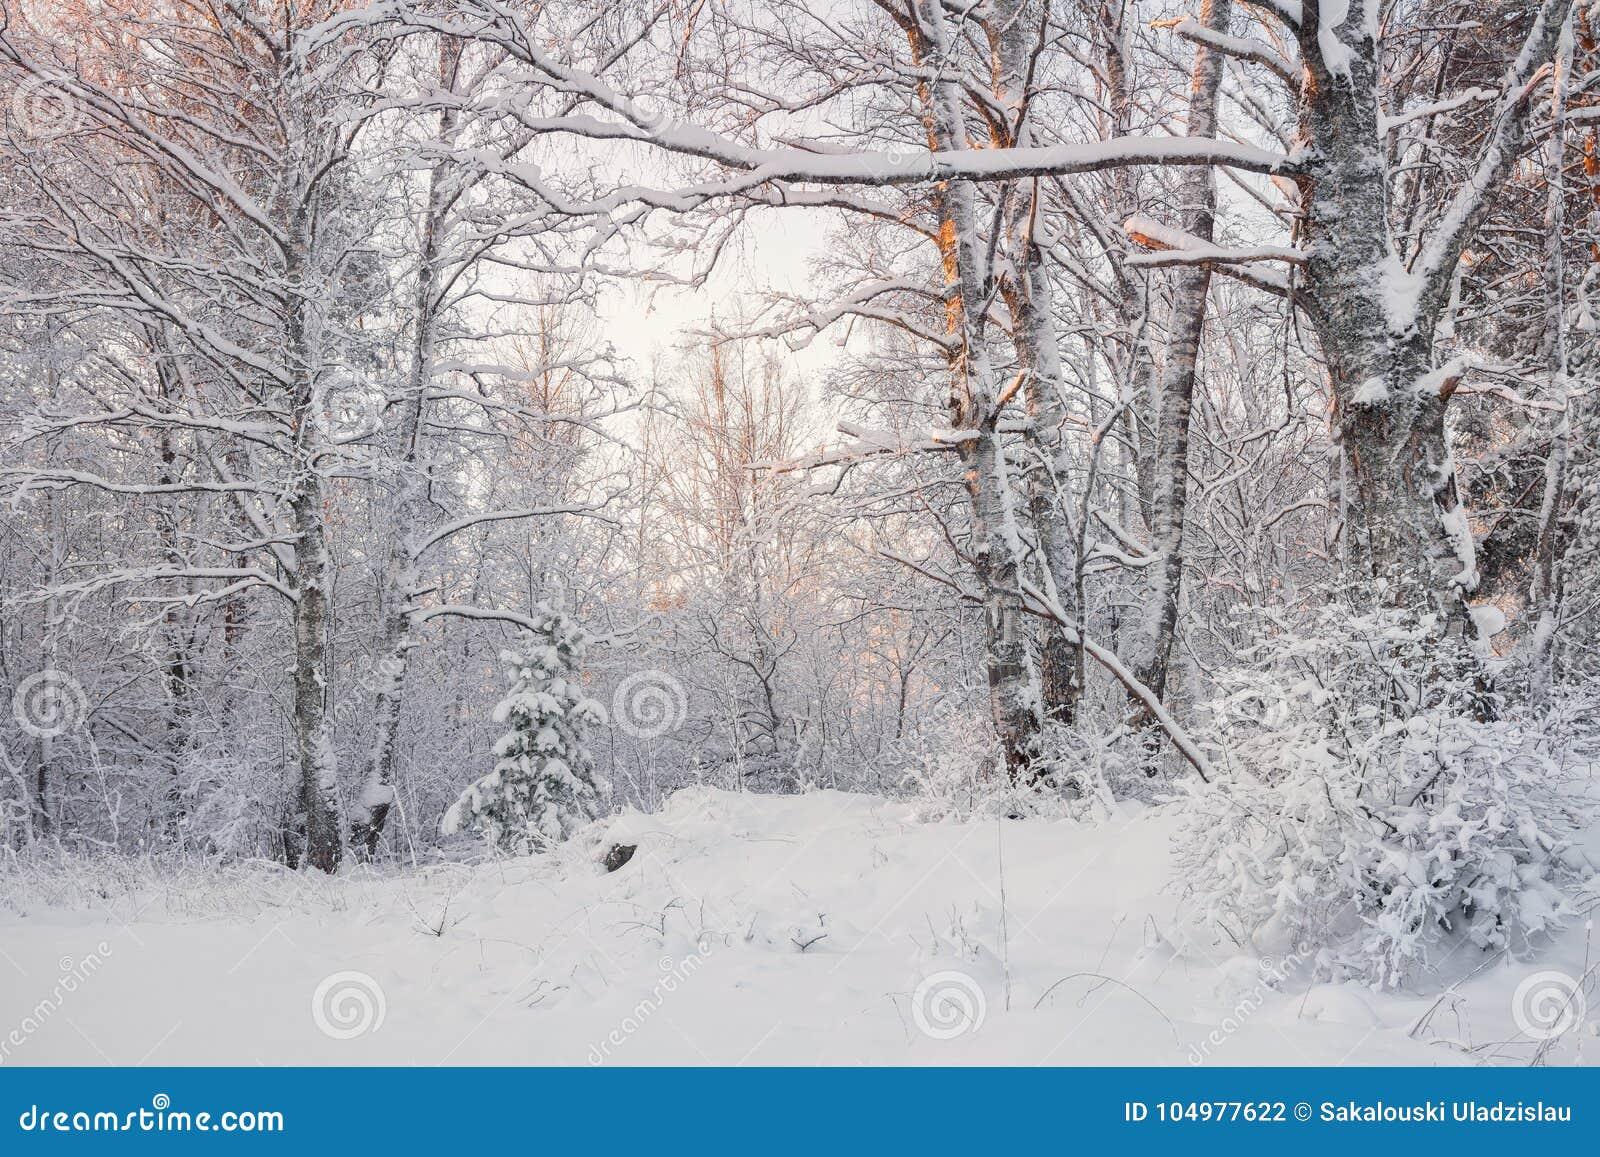 Frosty Landscape In Snowy ForestWinter Forest Landscape Härlig vintermorgon i den A Snö-täckte björken Forest Snow Covered Tr